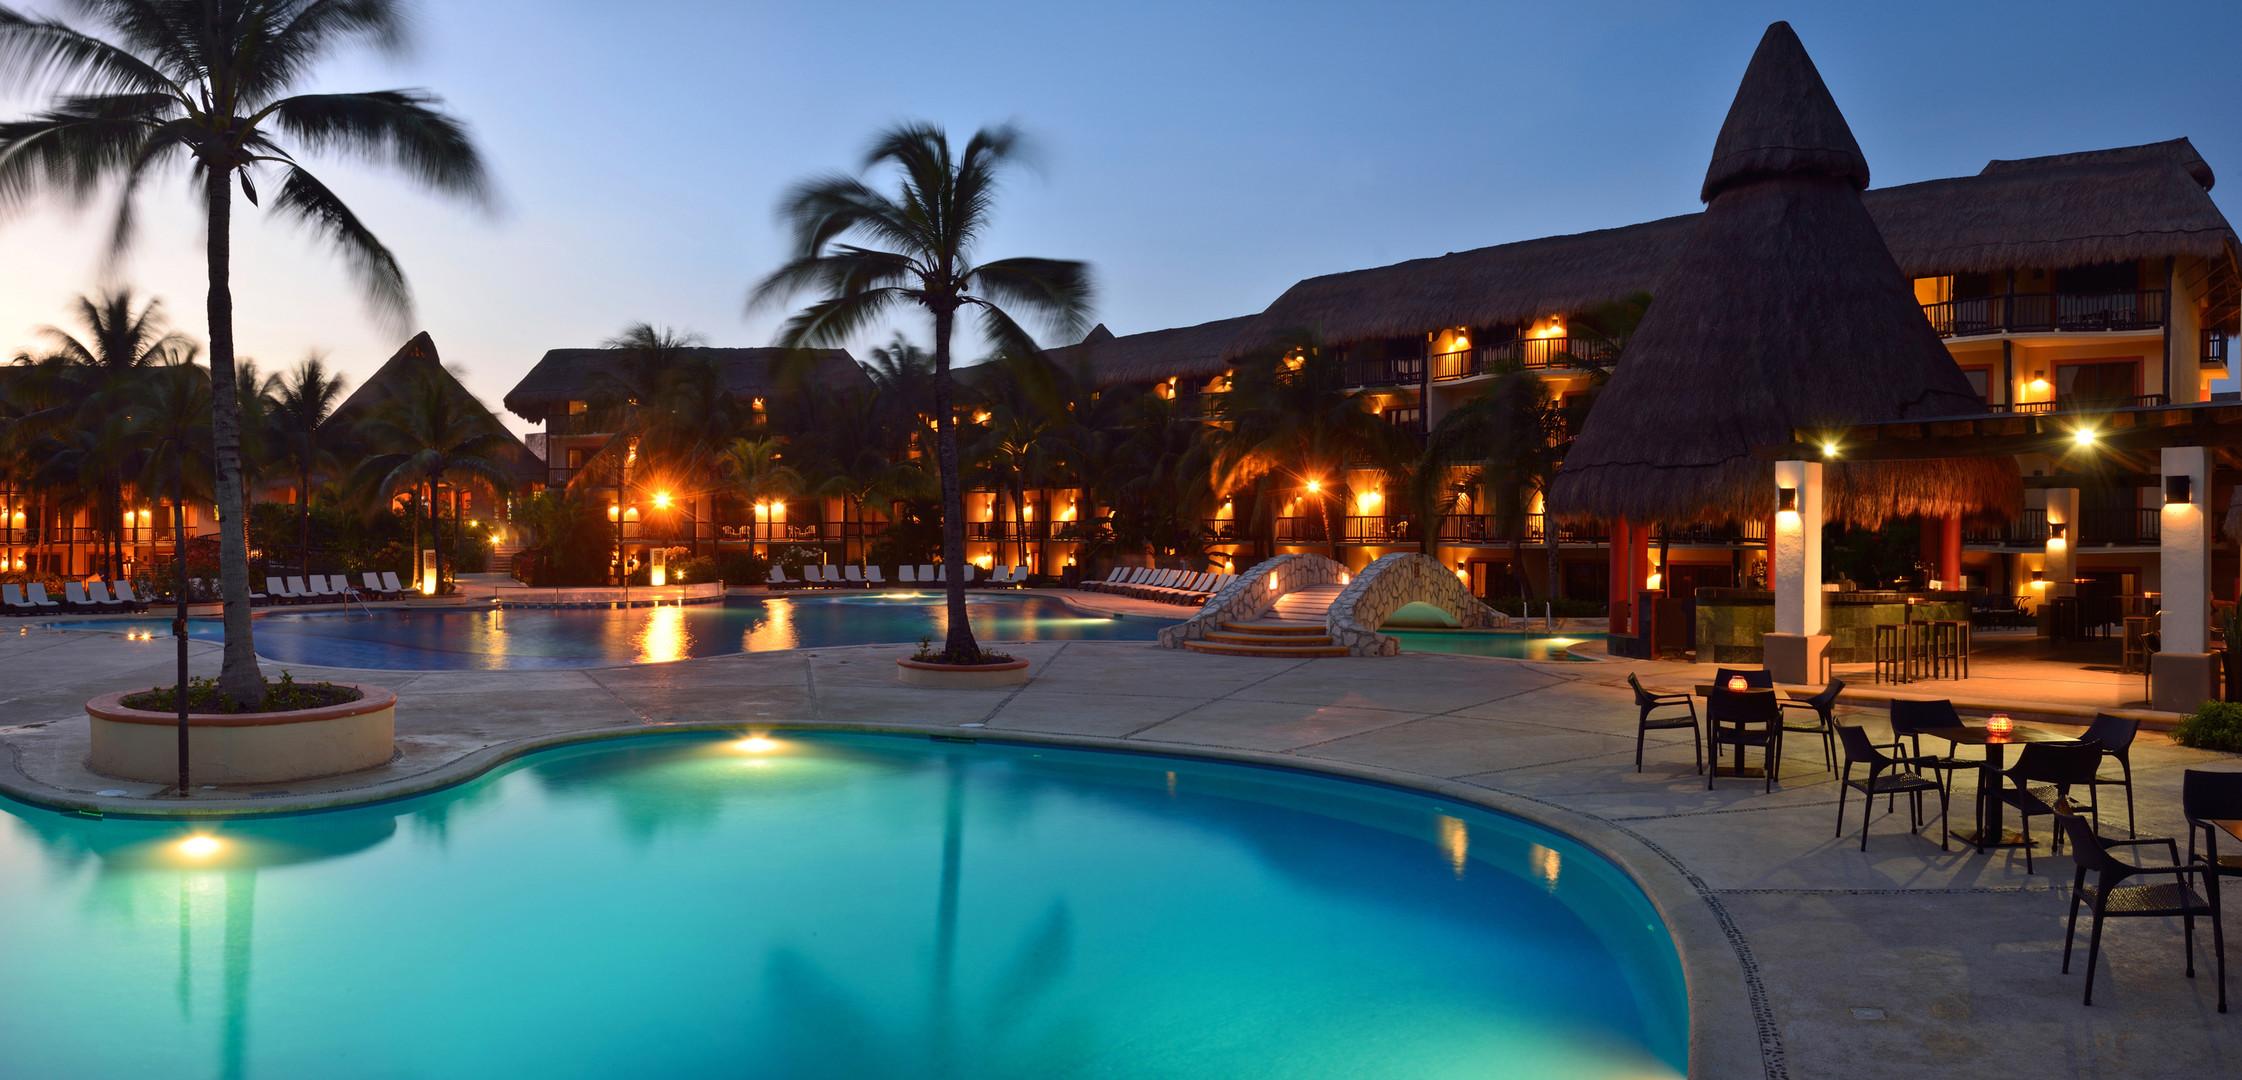 Catalonia Riviera Maya Resort & Spa #2